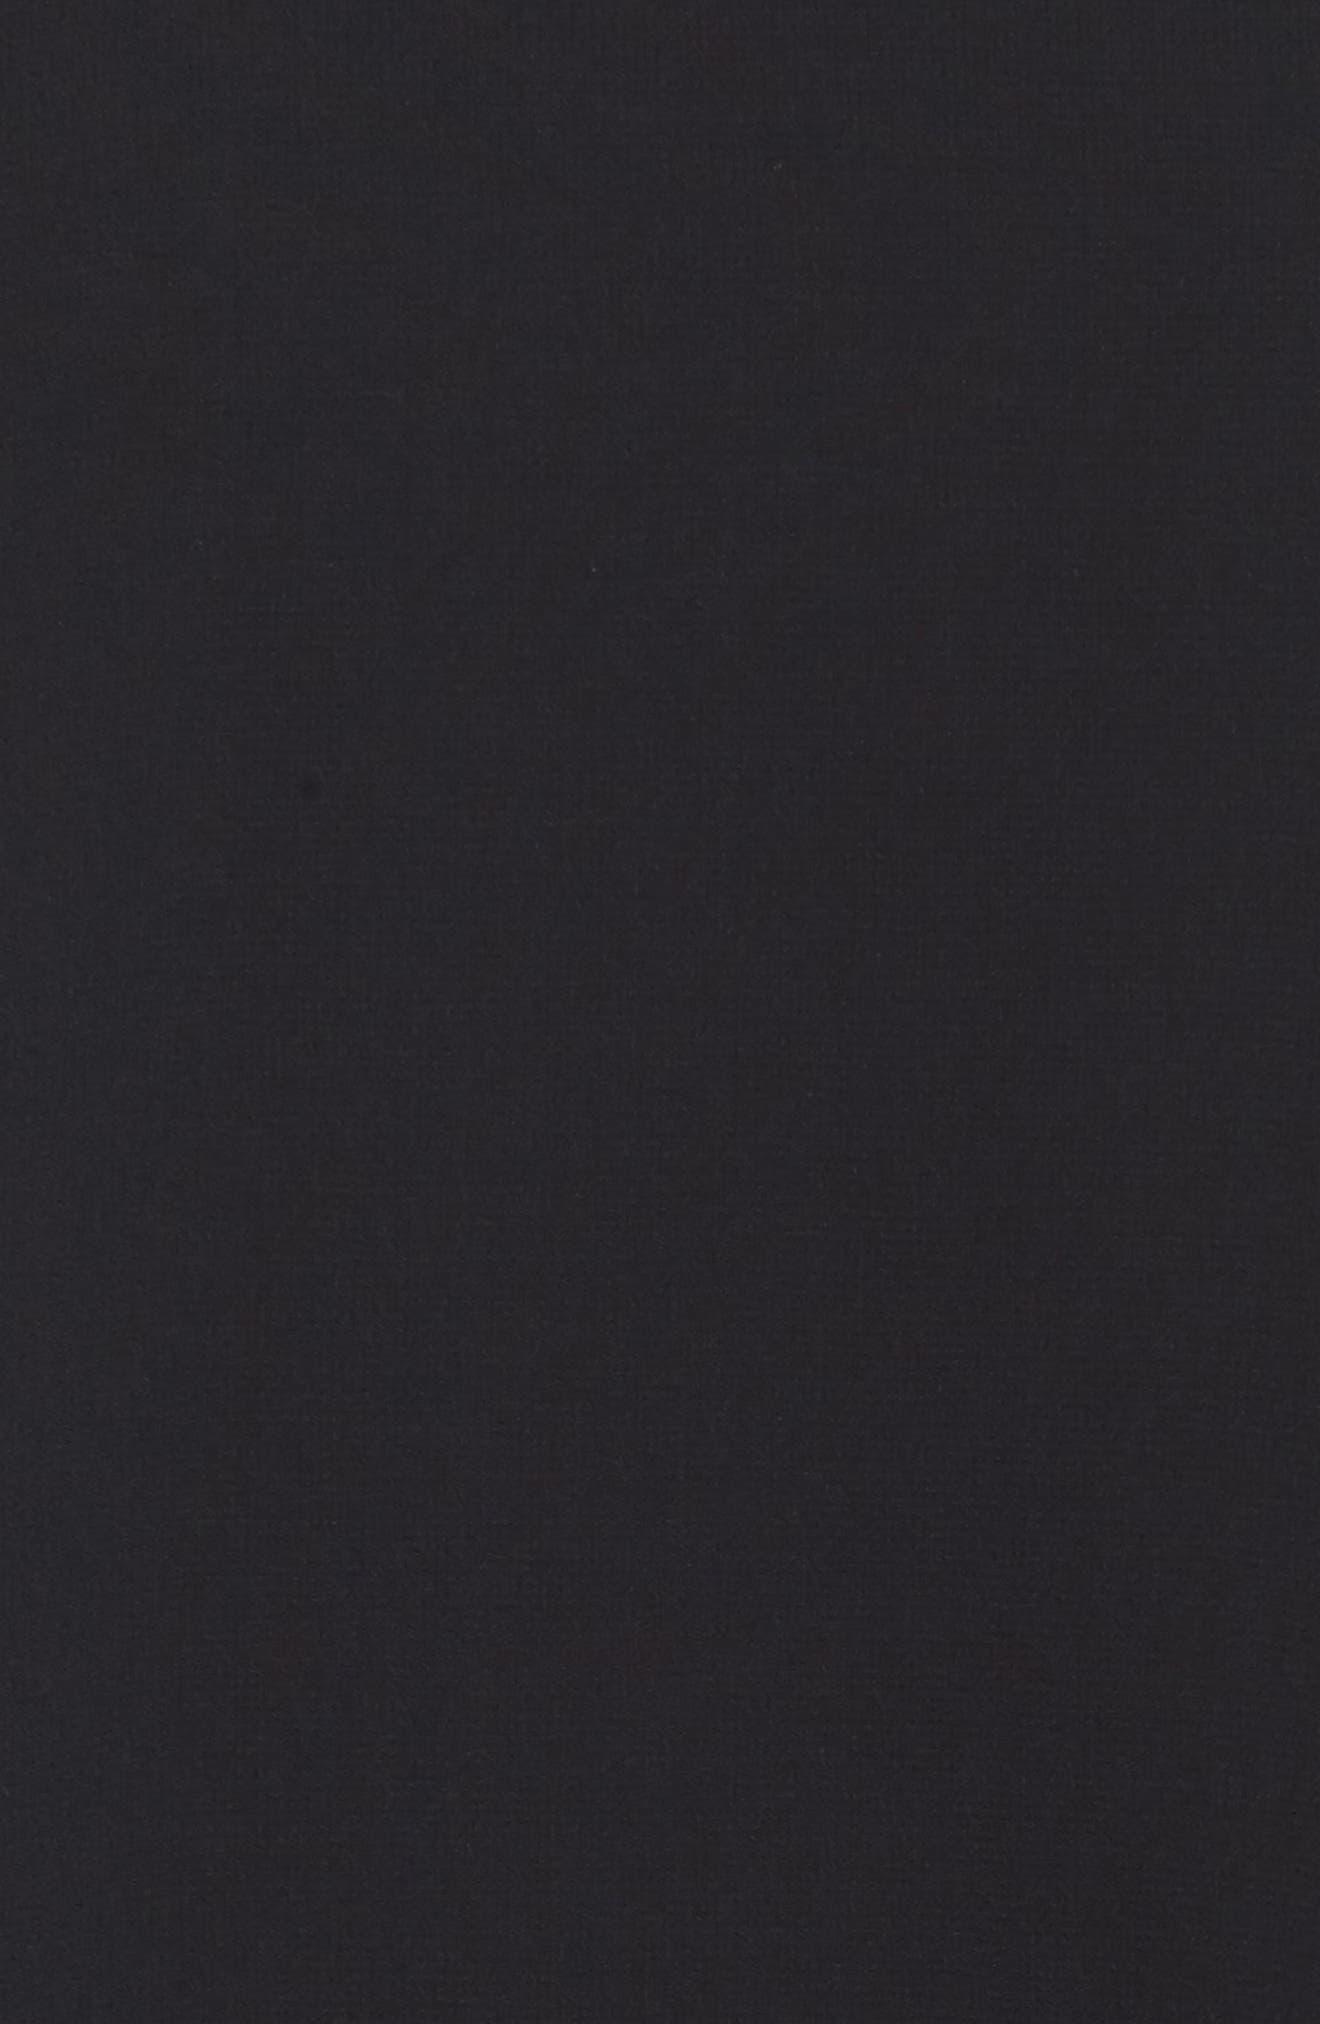 Sequin Chiffon Dress,                             Alternate thumbnail 5, color,                             Black Onyx